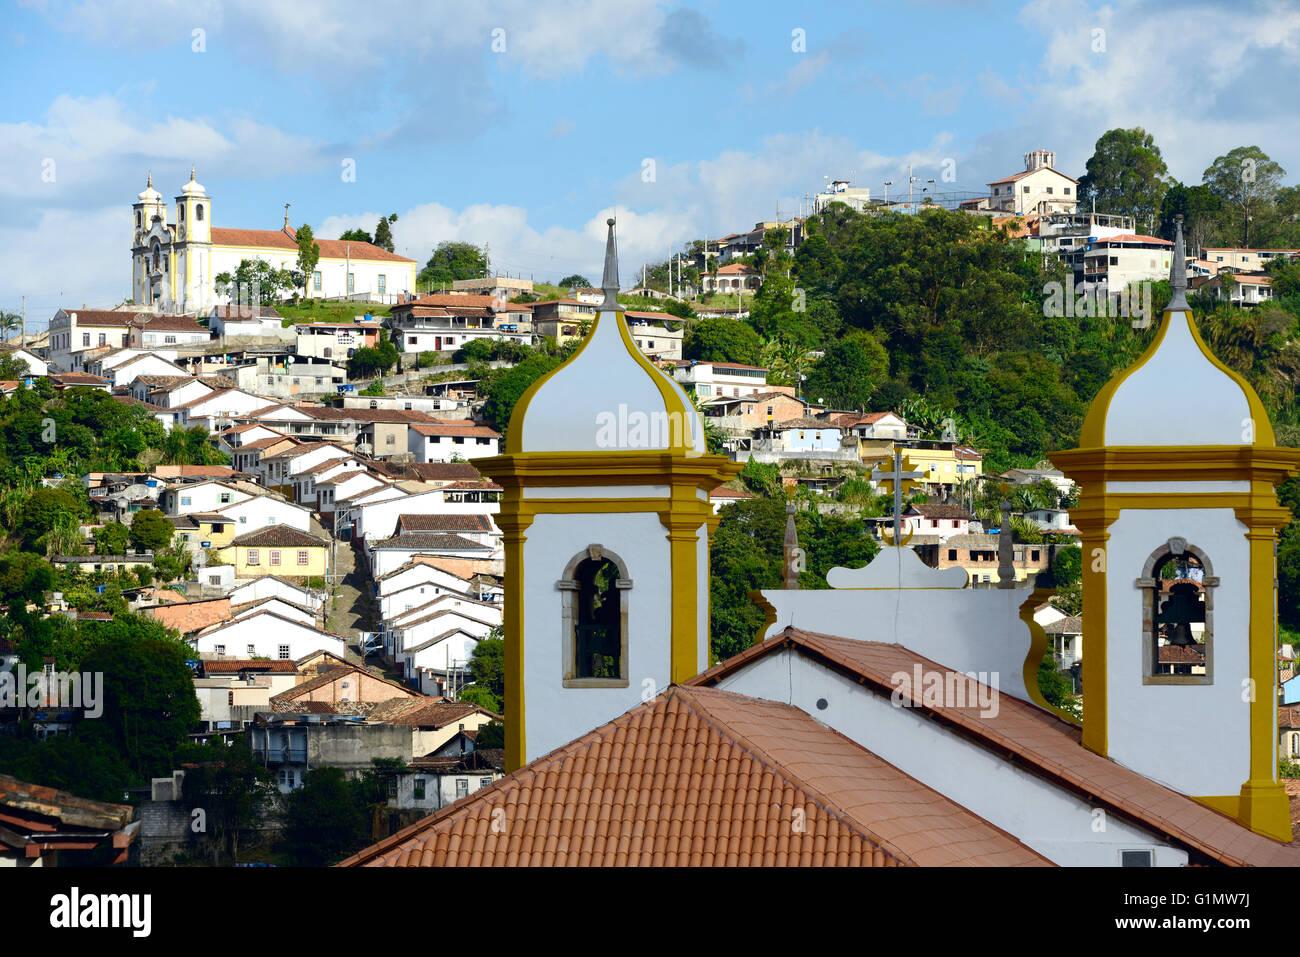 View of the unesco world heritage city of Ouro Preto in Minas Gerais Brazil - Stock Image